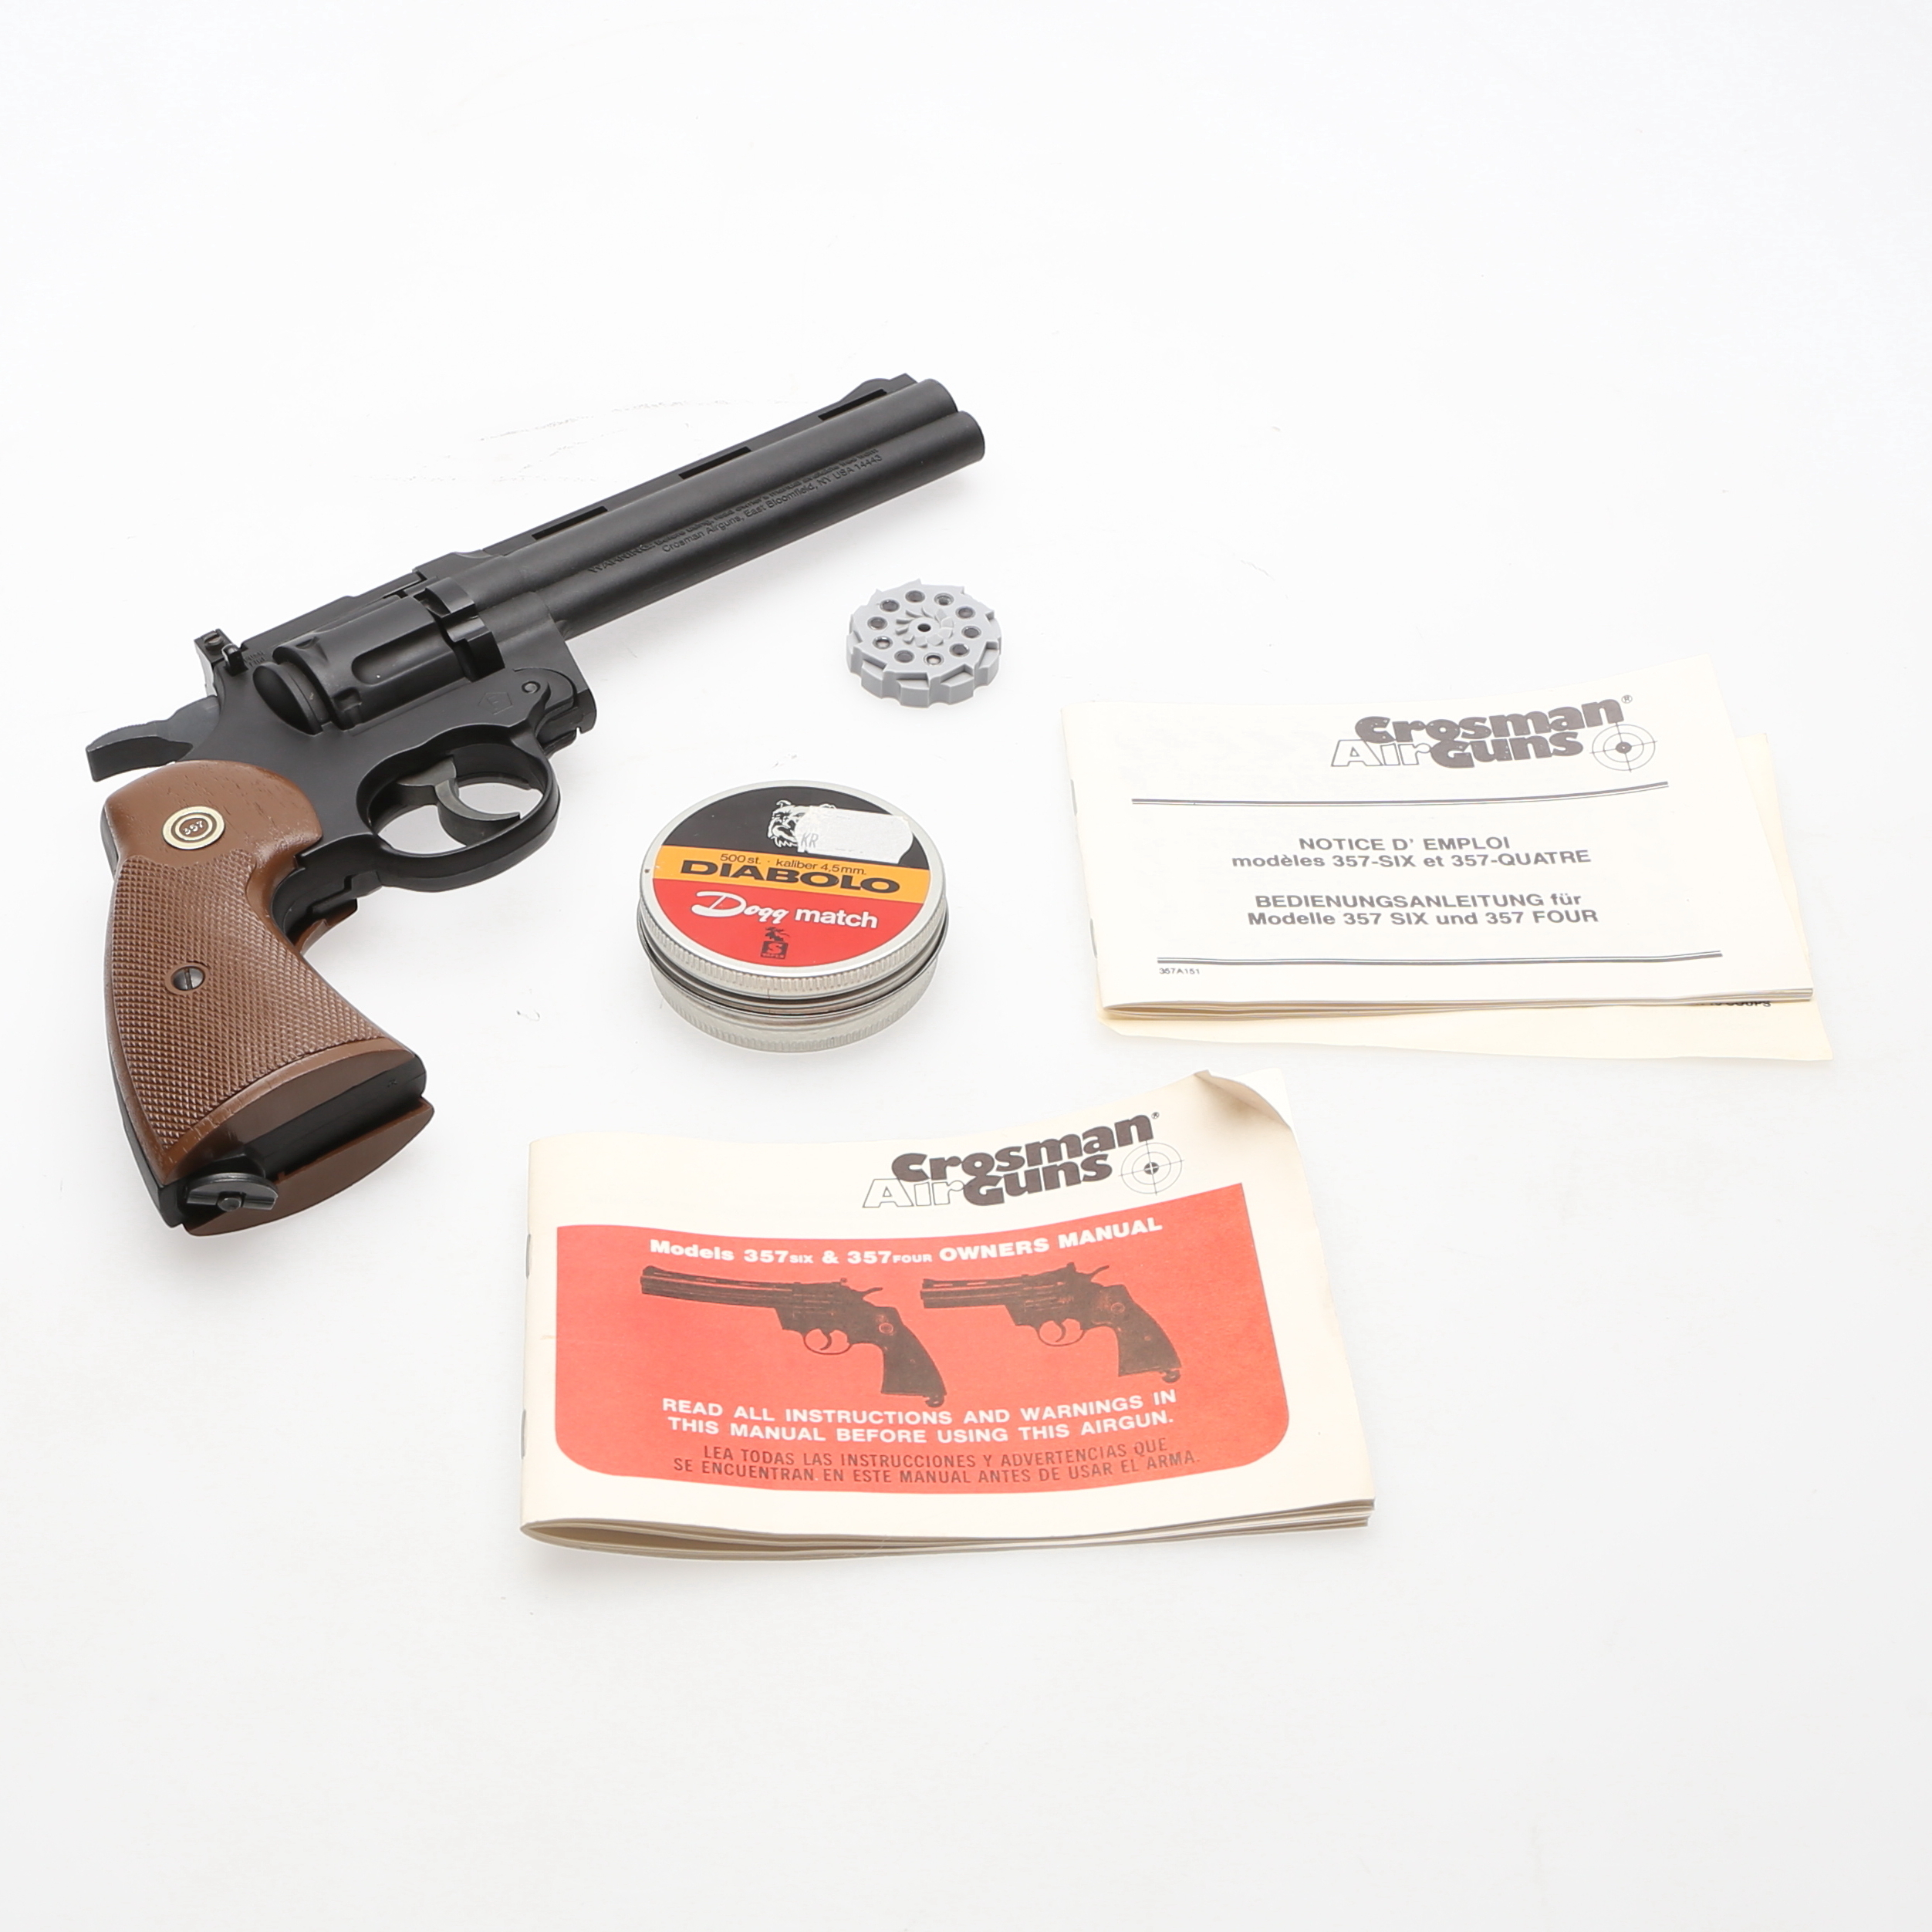 Crosman 357 Revolver